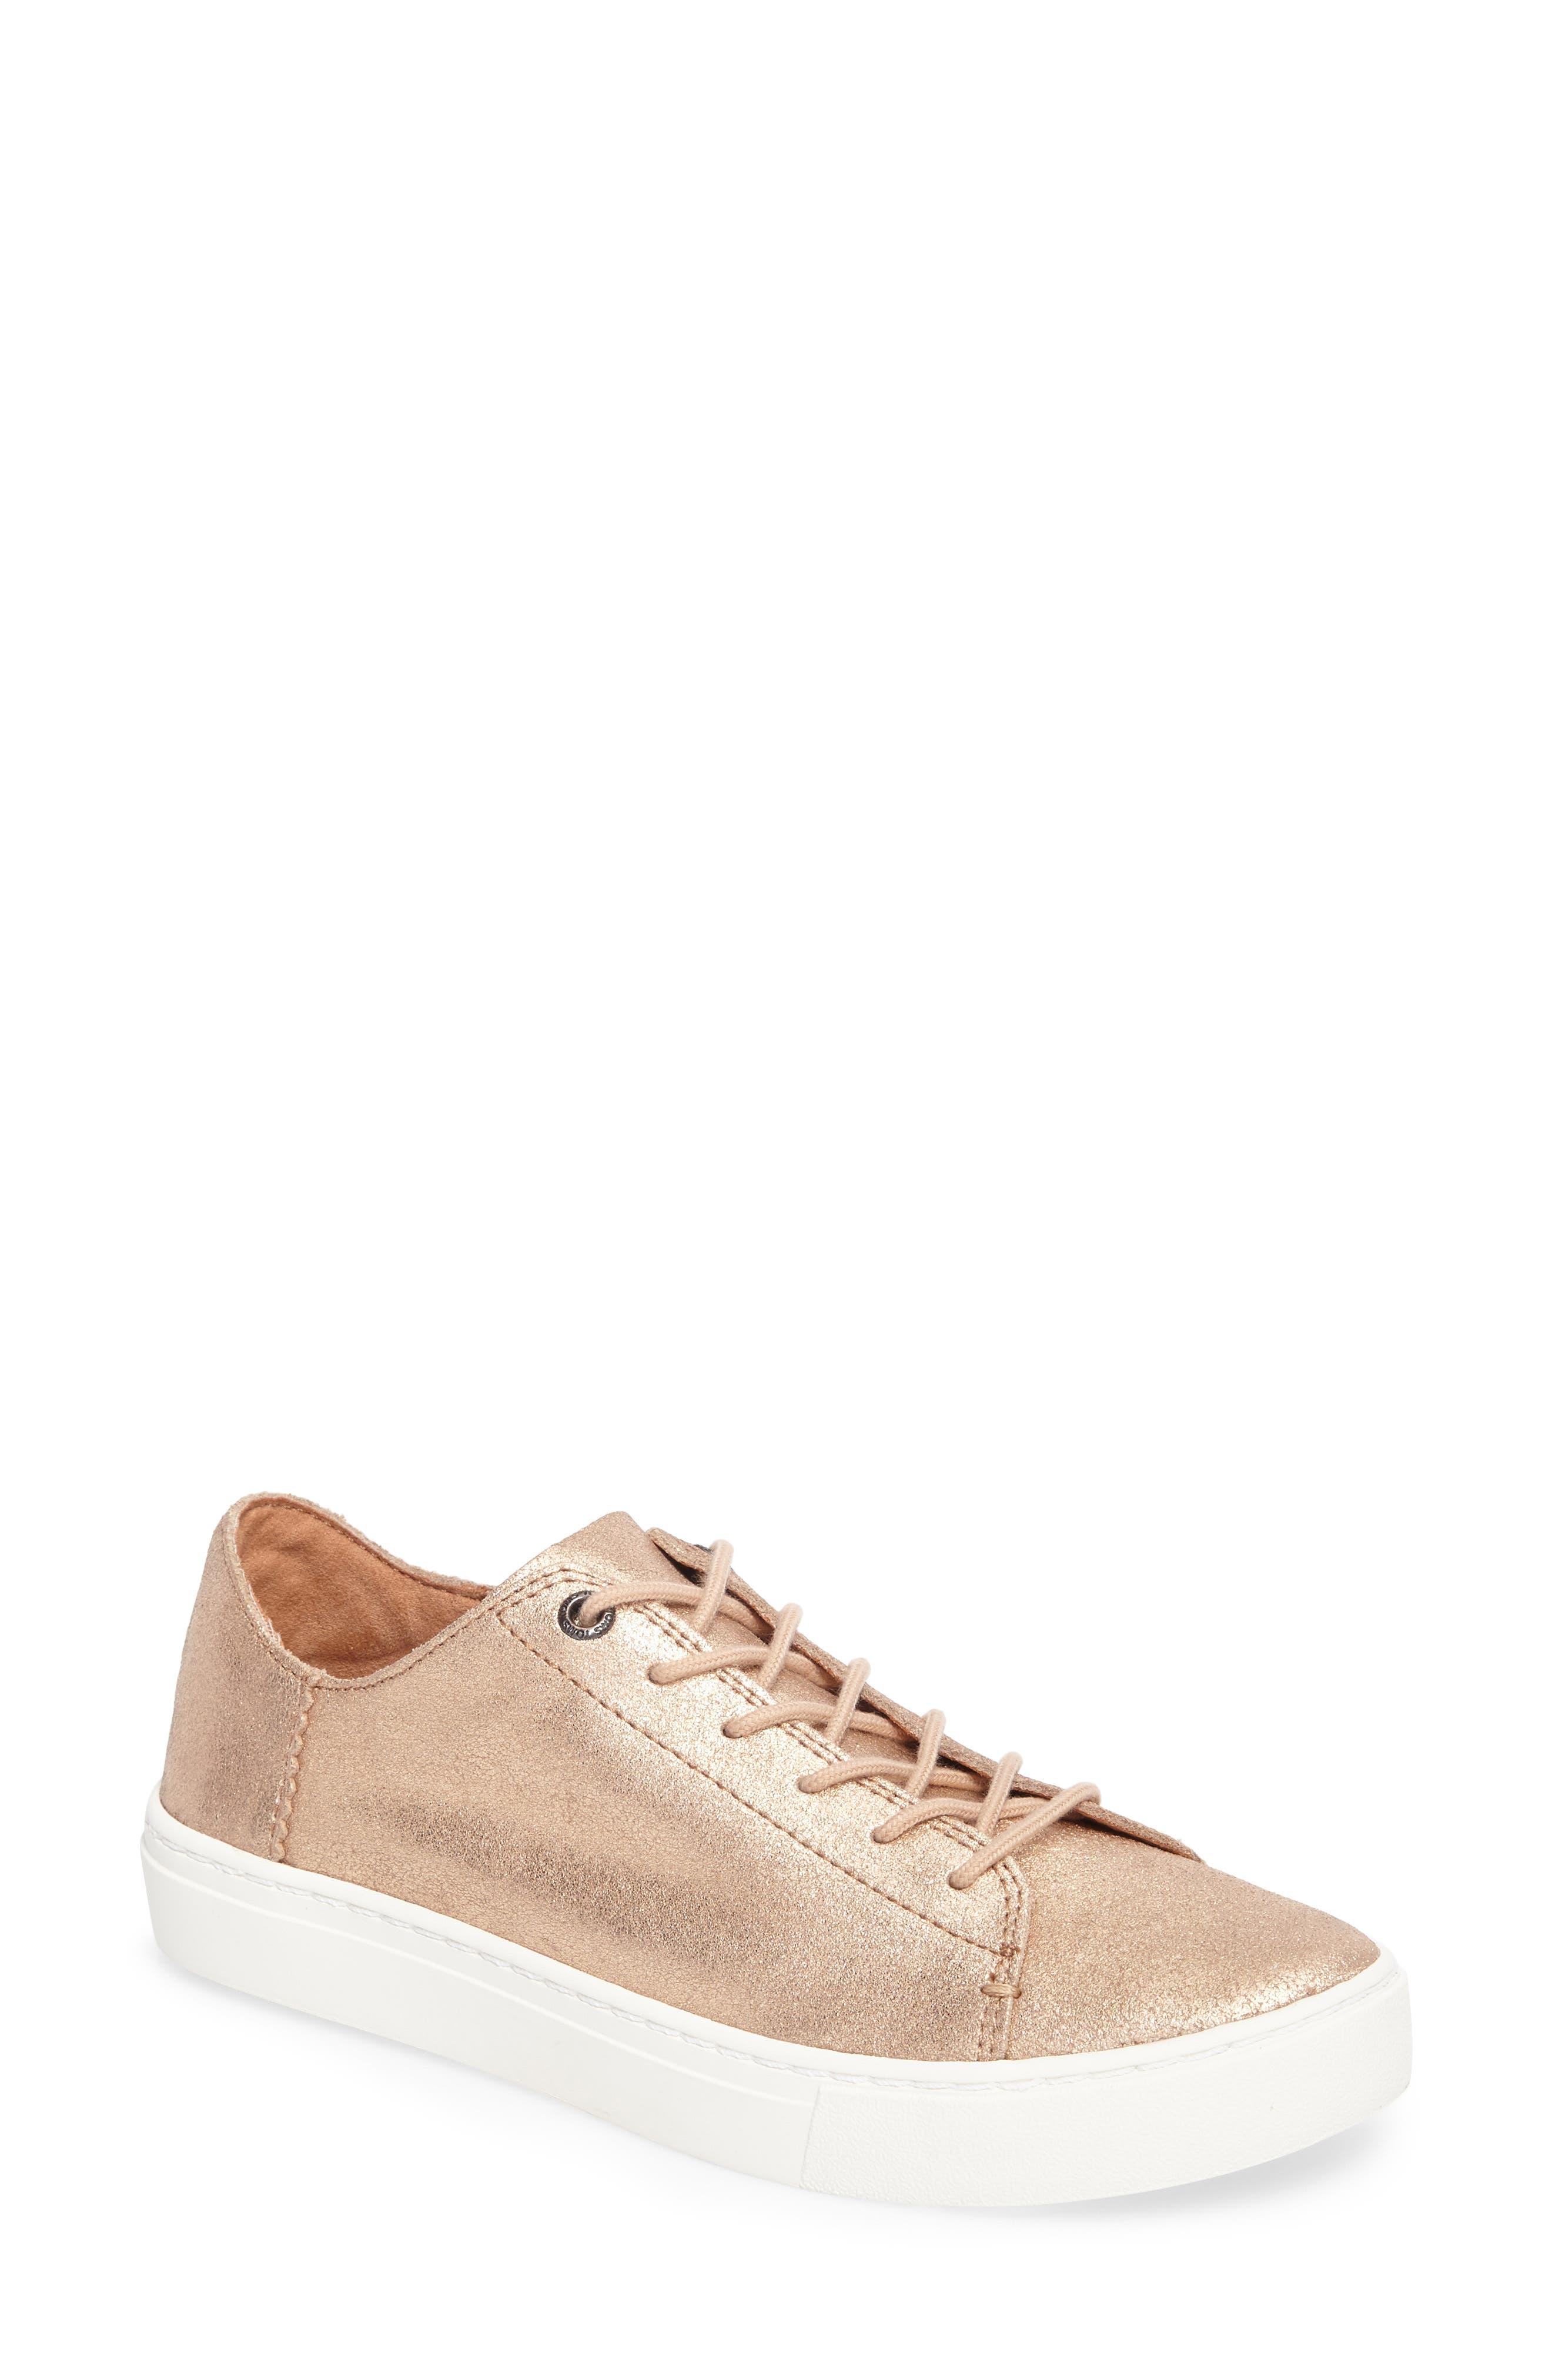 Alternate Image 1 Selected - TOMS Lenox Sneaker (Women)